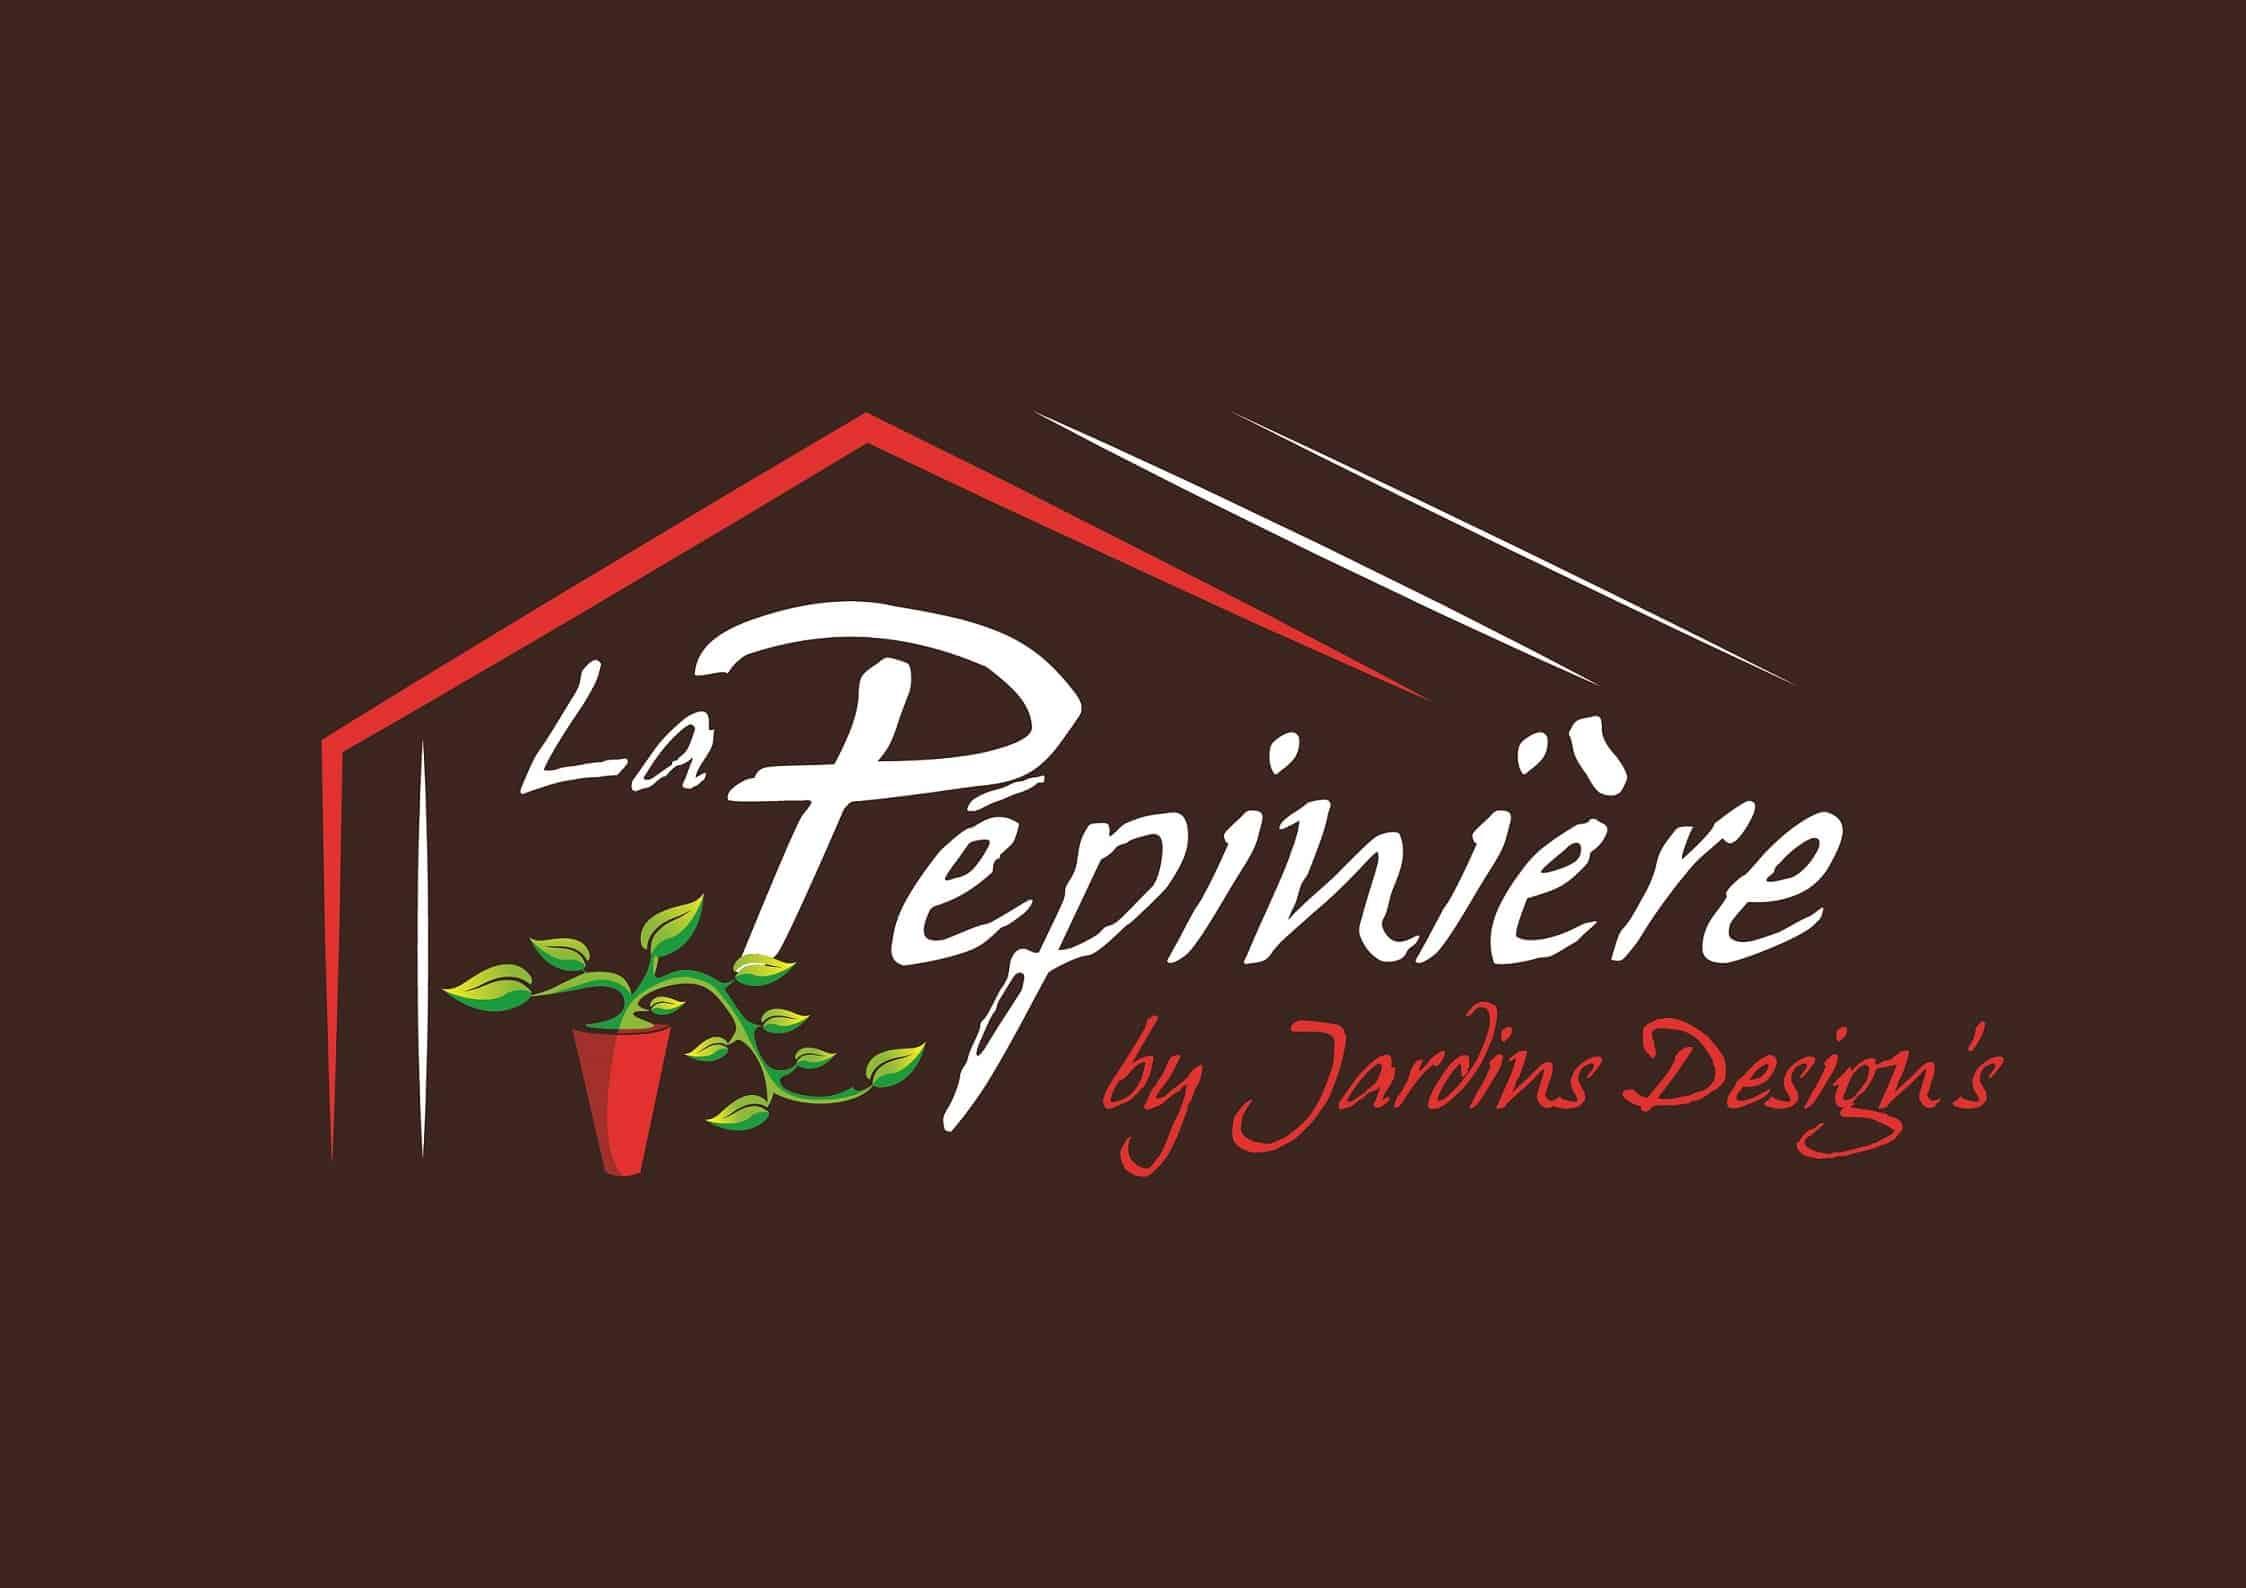 Logo SAS LA PEPINIERE BY JARDINS DESIGN'S